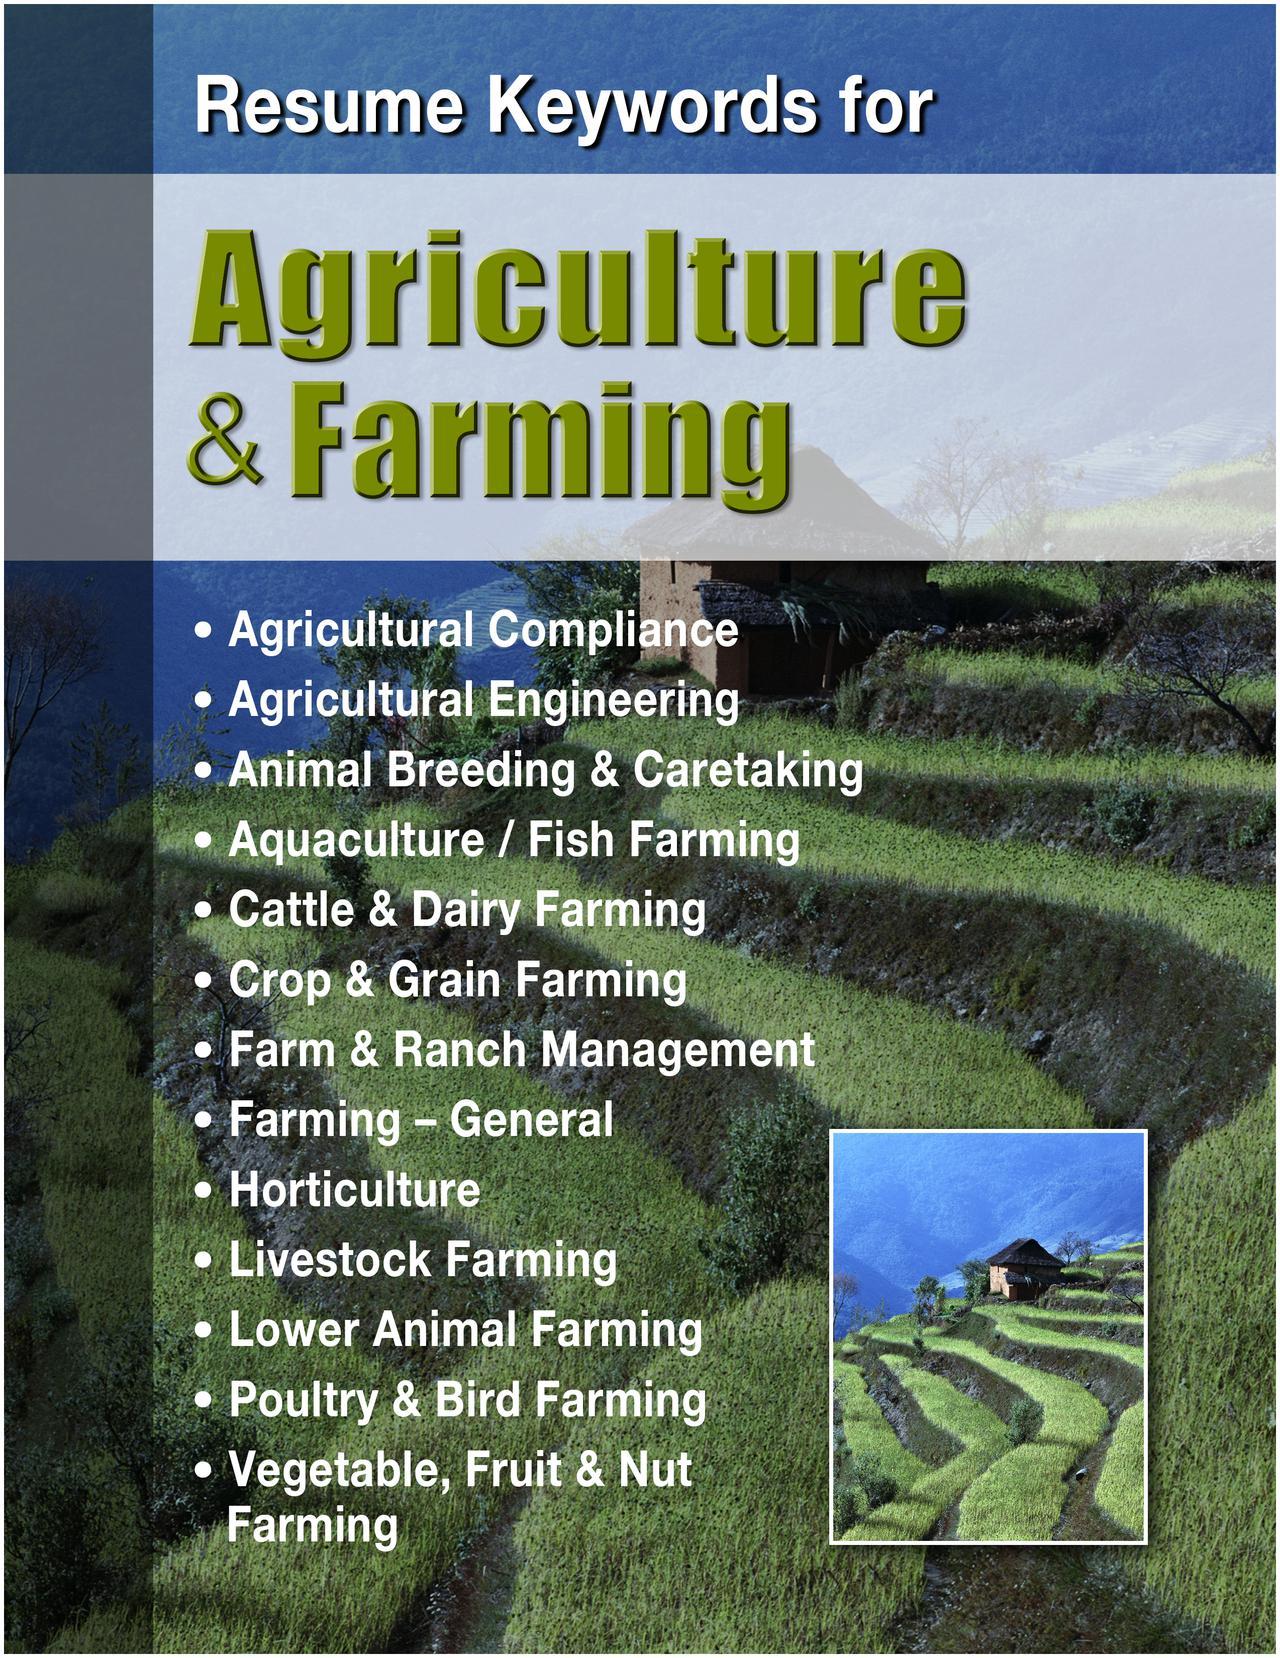 agriculture & farming divider.jpg